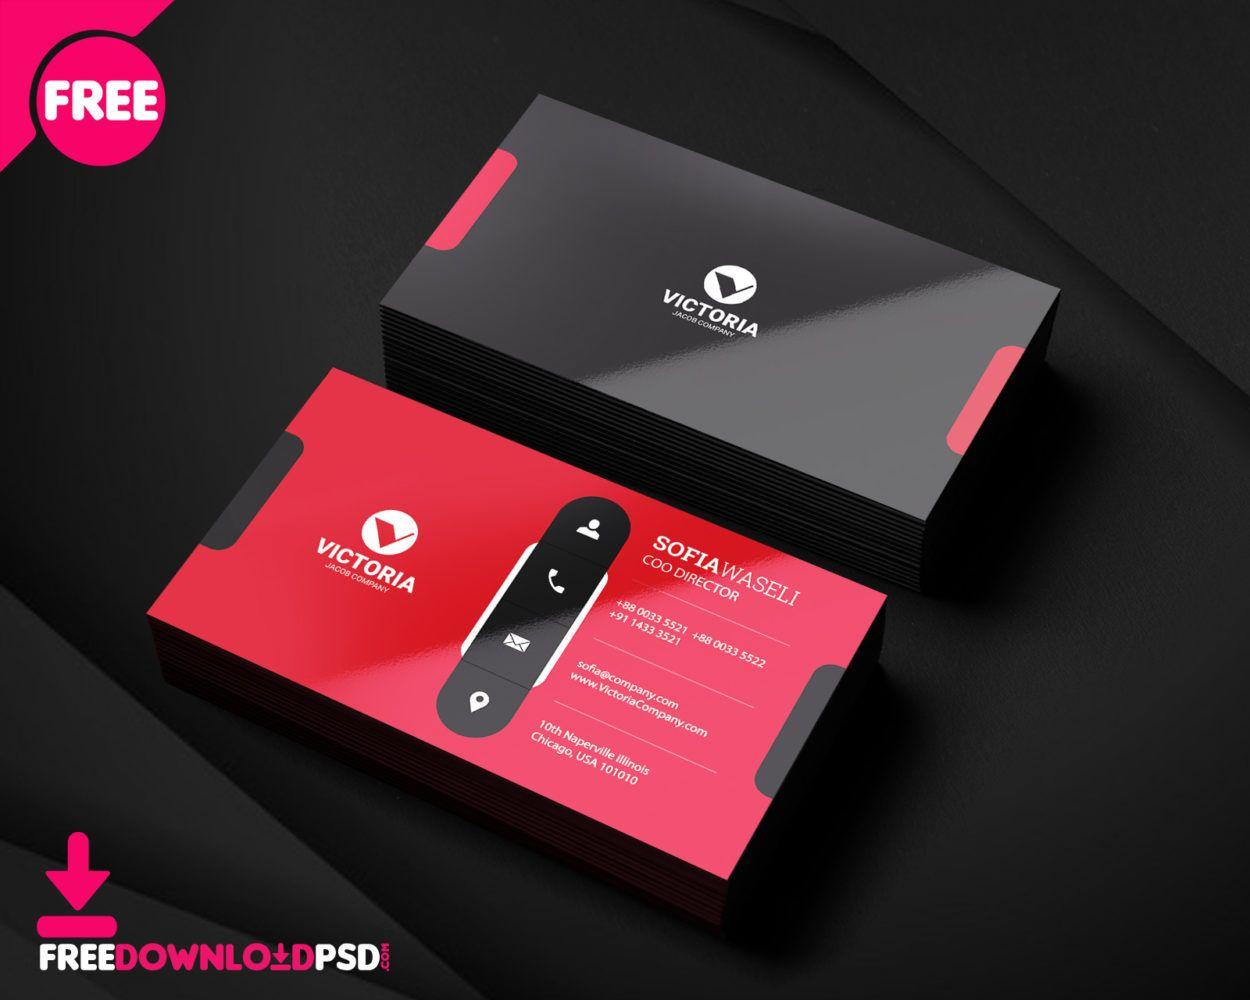 Premium Business Card Psd Free Business Card Templates Business Card Psd Business Card Template Psd